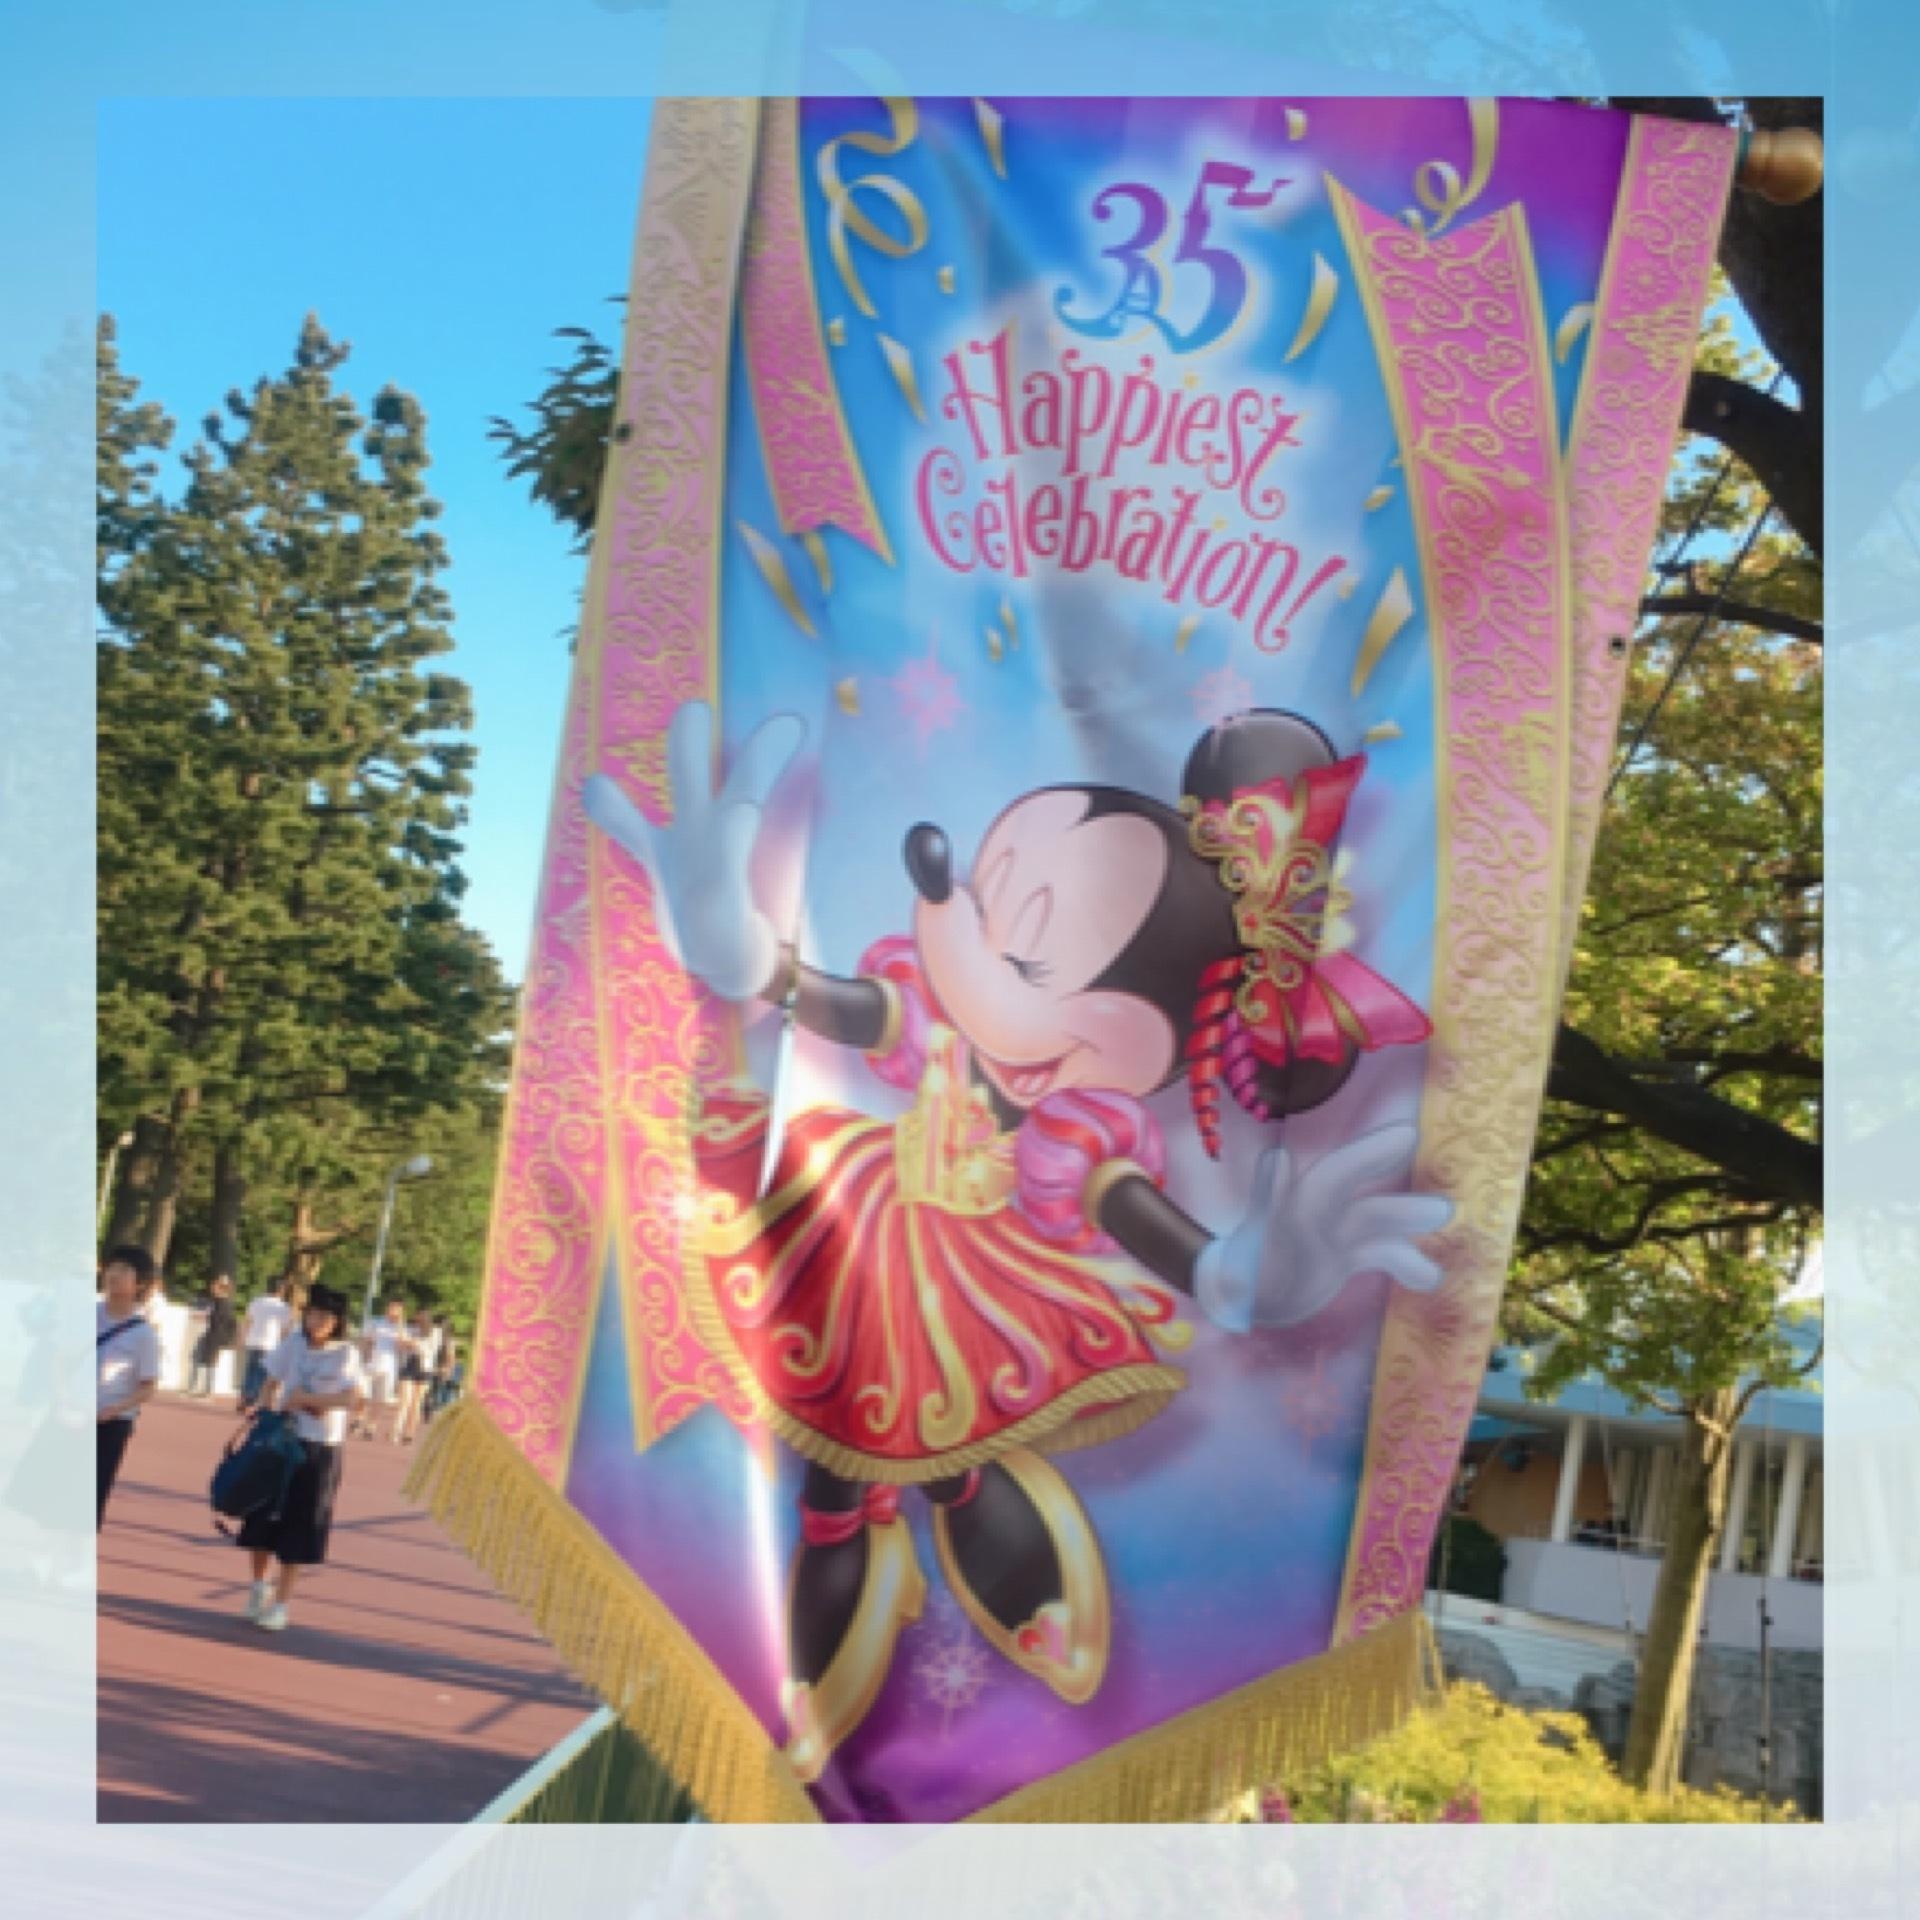 Tokyo Disneyland《 35 Happiest Gelebration! 》に行ってきました♫_1_5-3